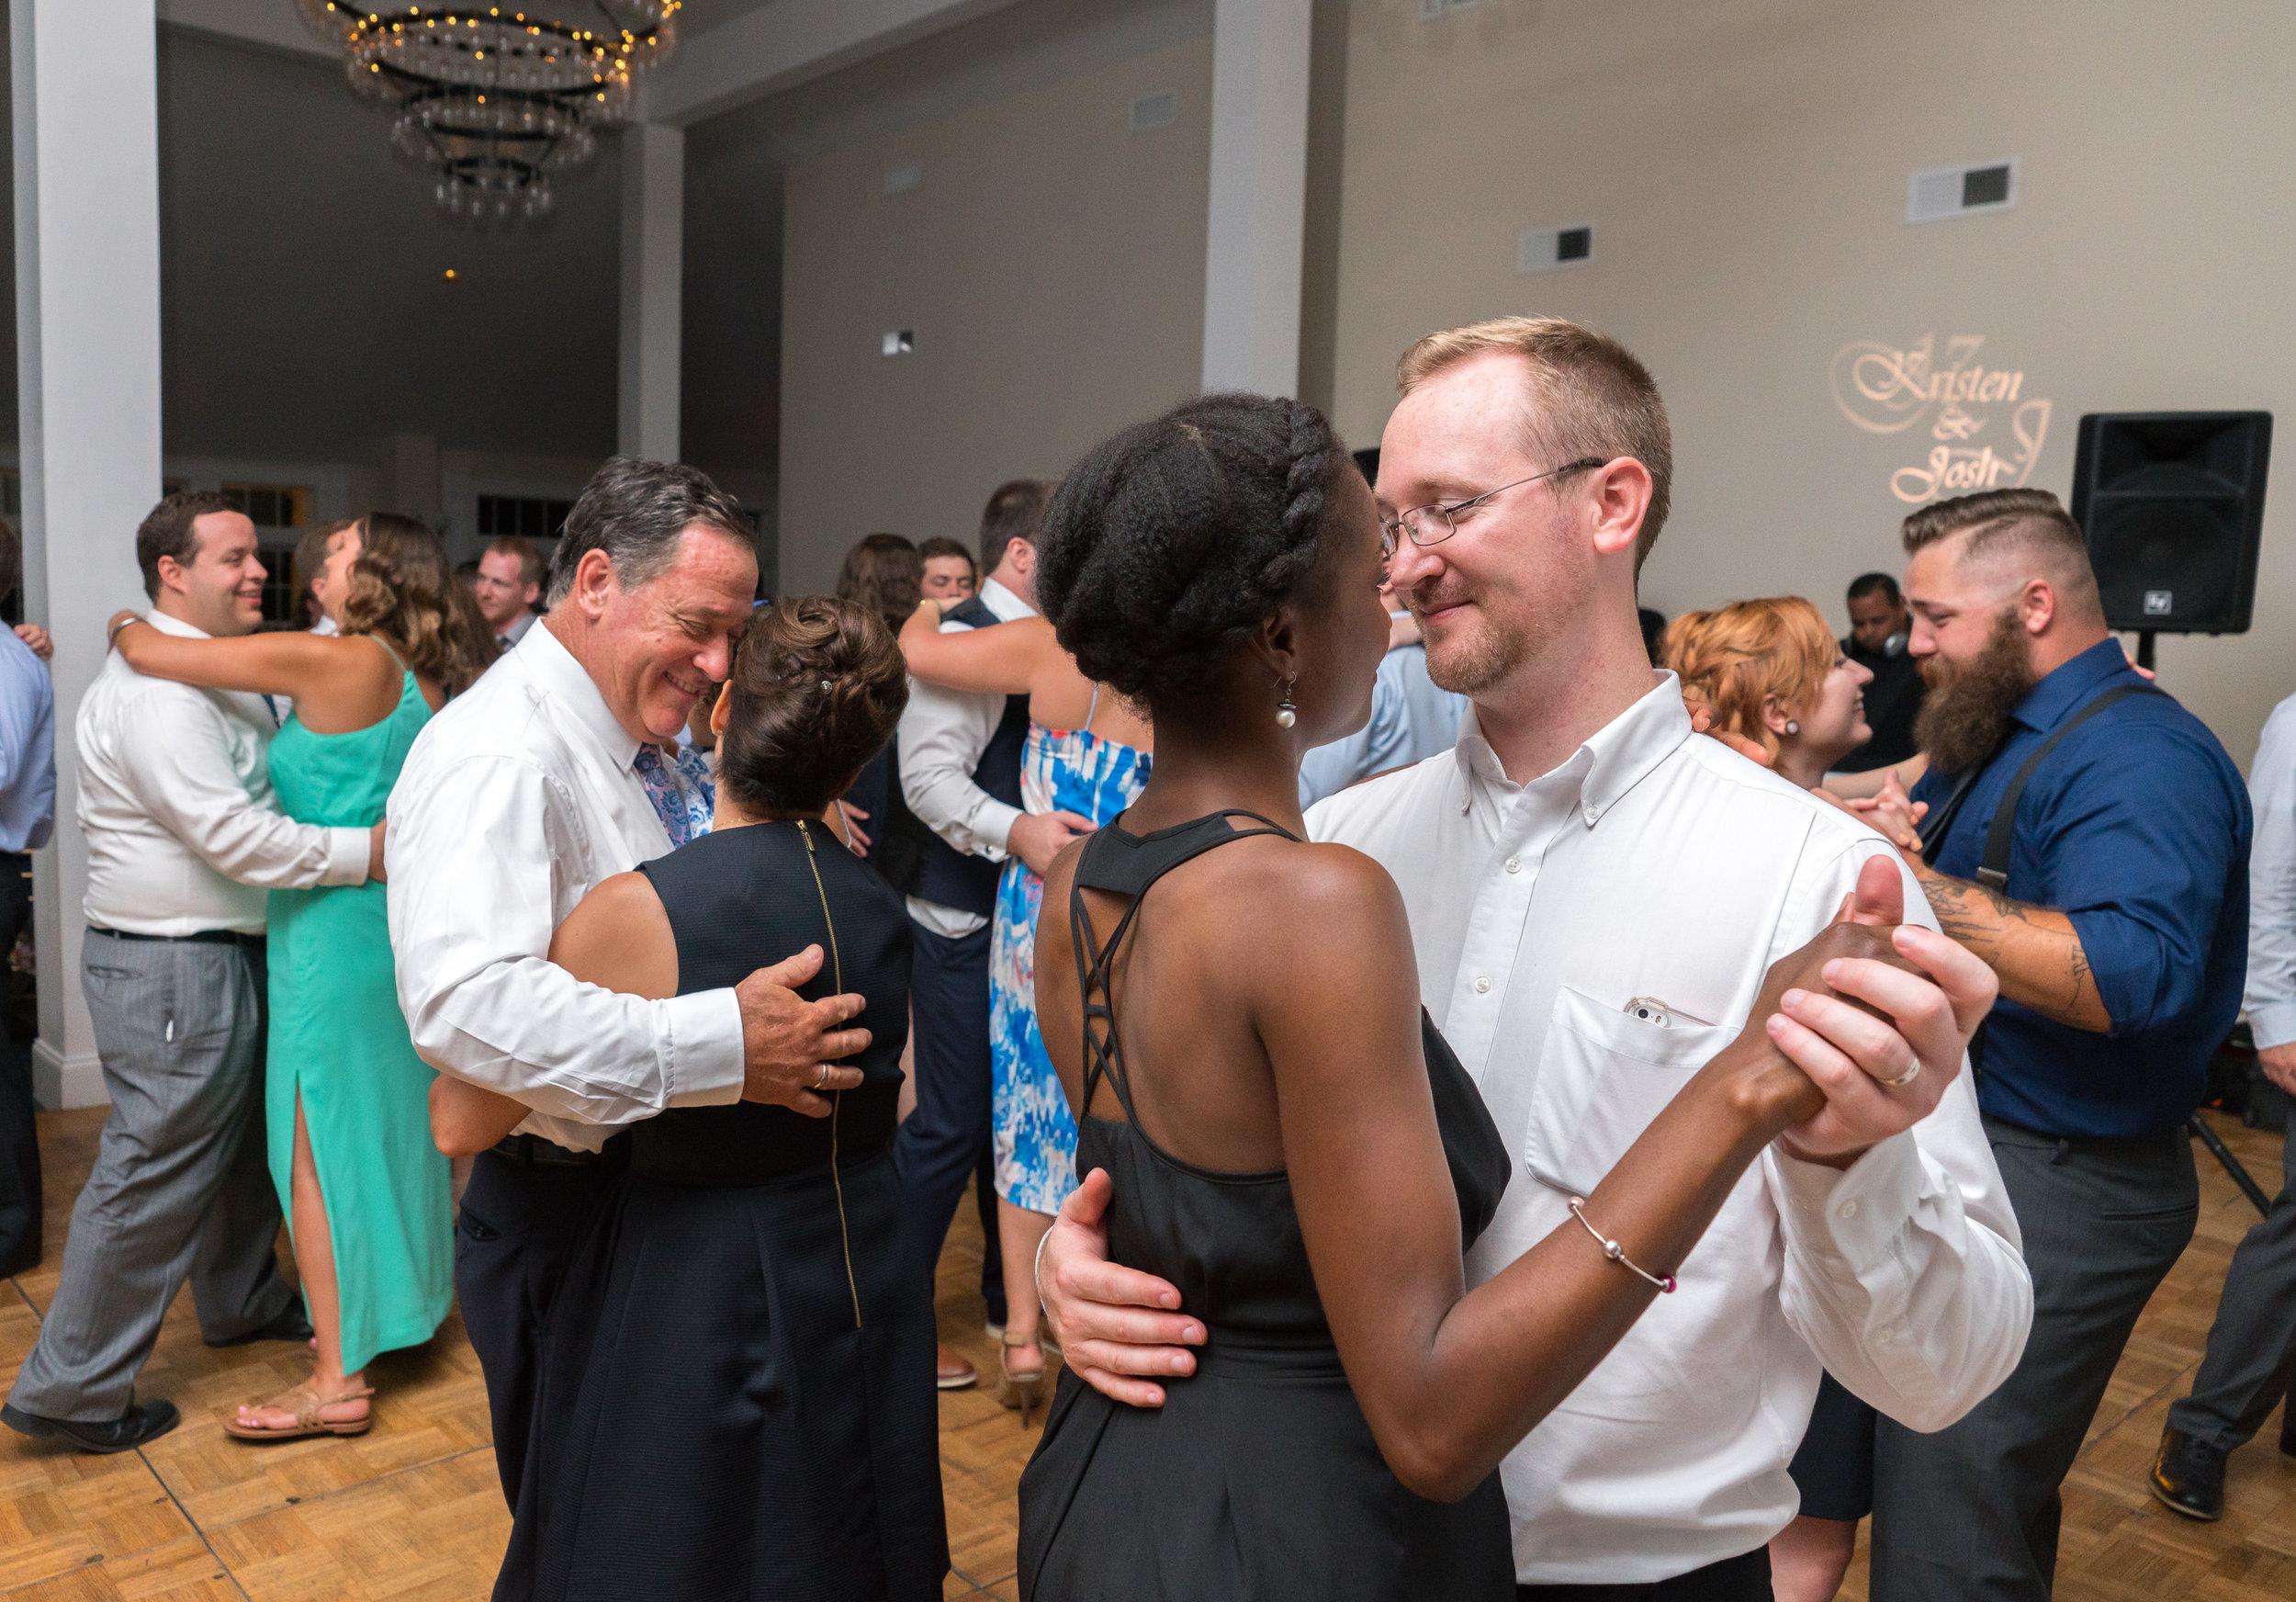 Slow dance during wedding reception at Springfield Manor Distillery